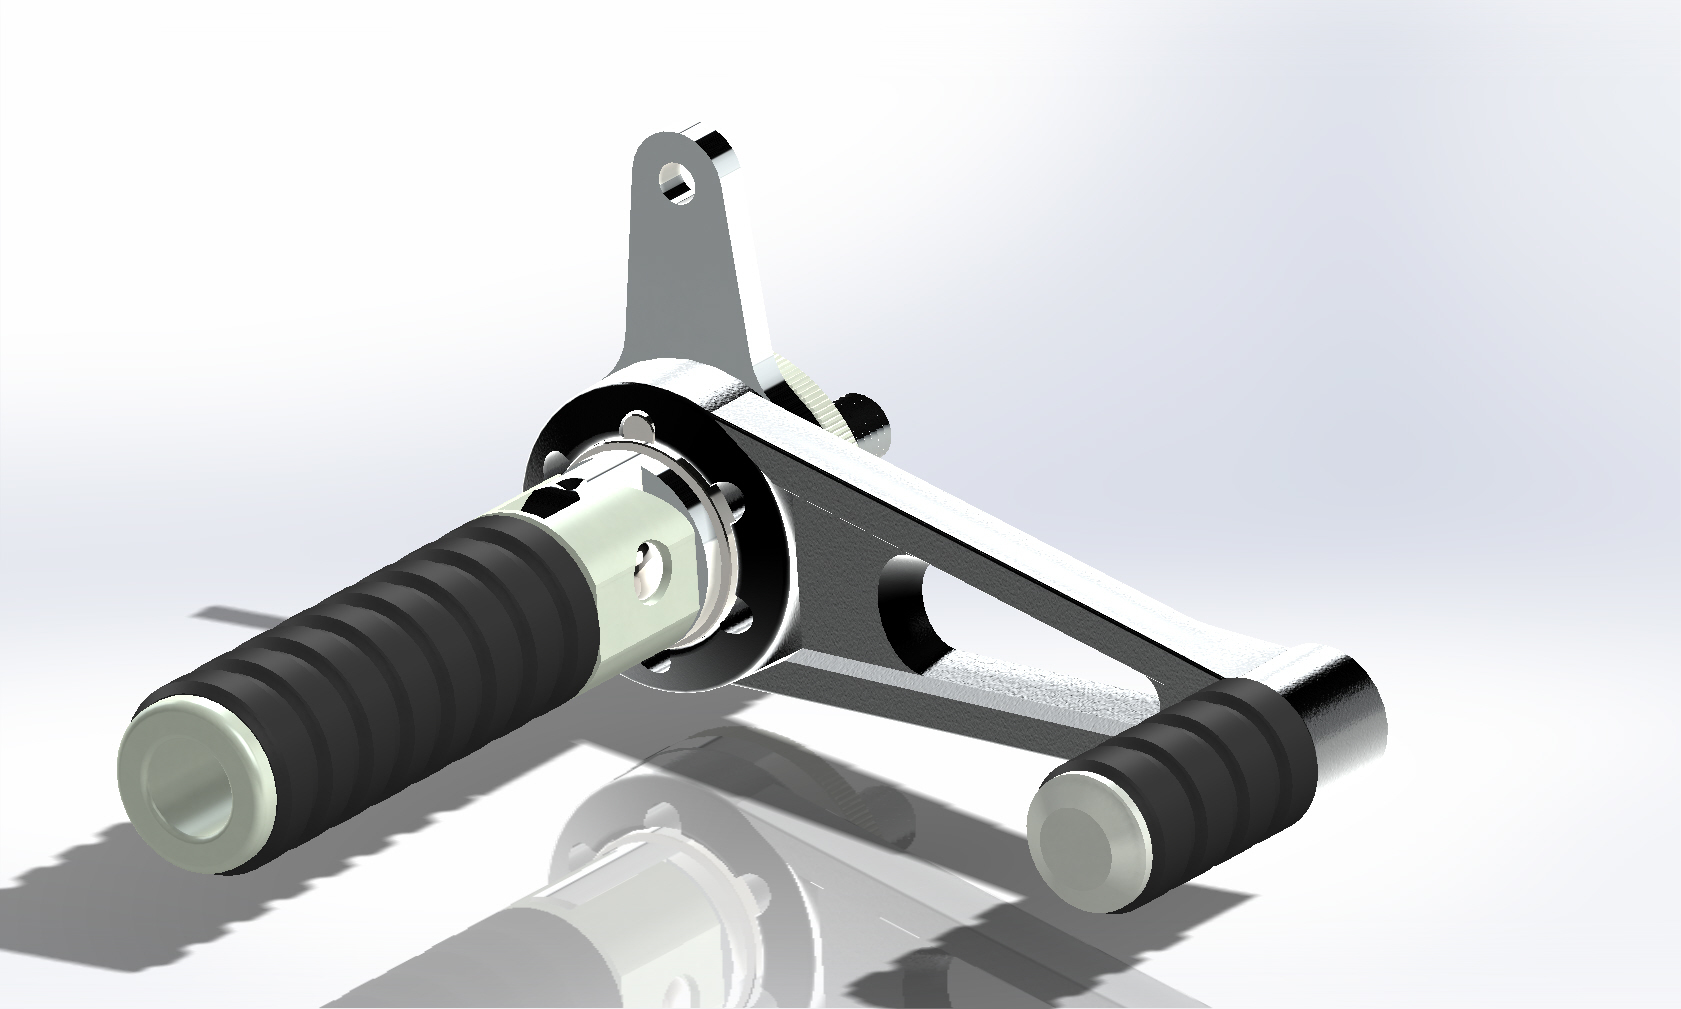 W650 ミッドコントロール商品開発_a0139843_23495664.jpg